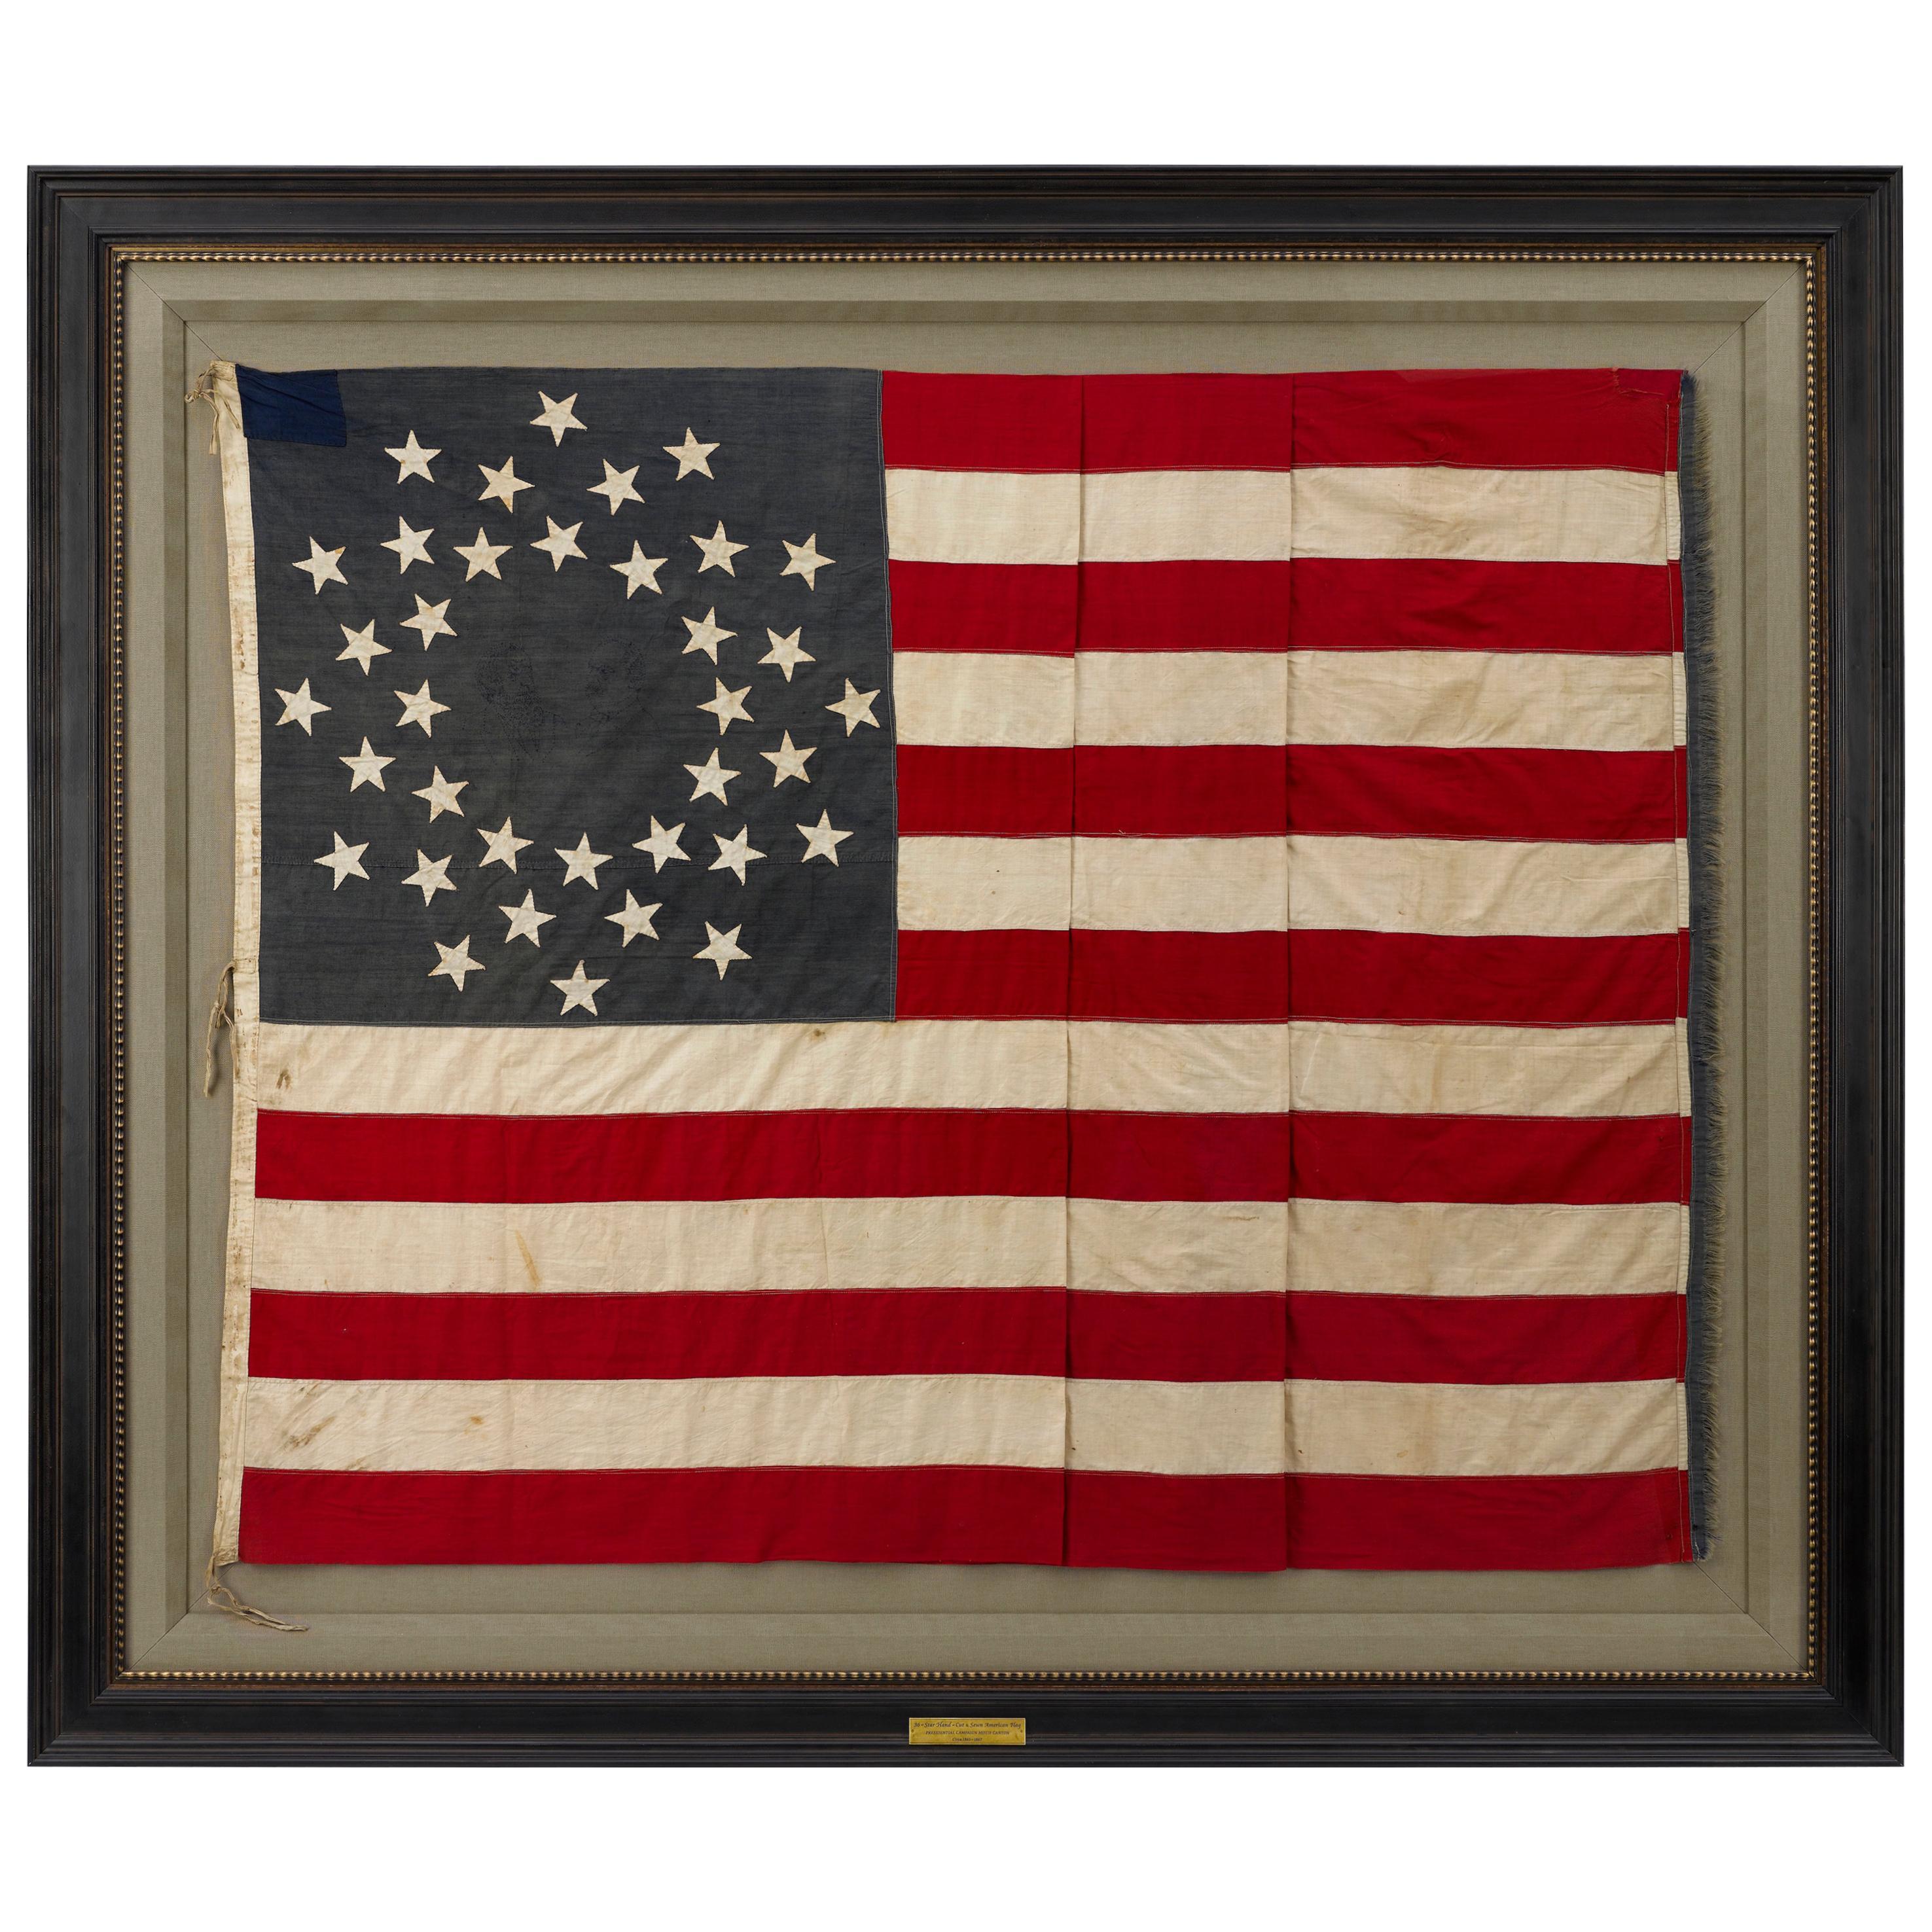 36-Star American Flag, Hand-Cut and Sewn, Civil War Era with Rare Pattern